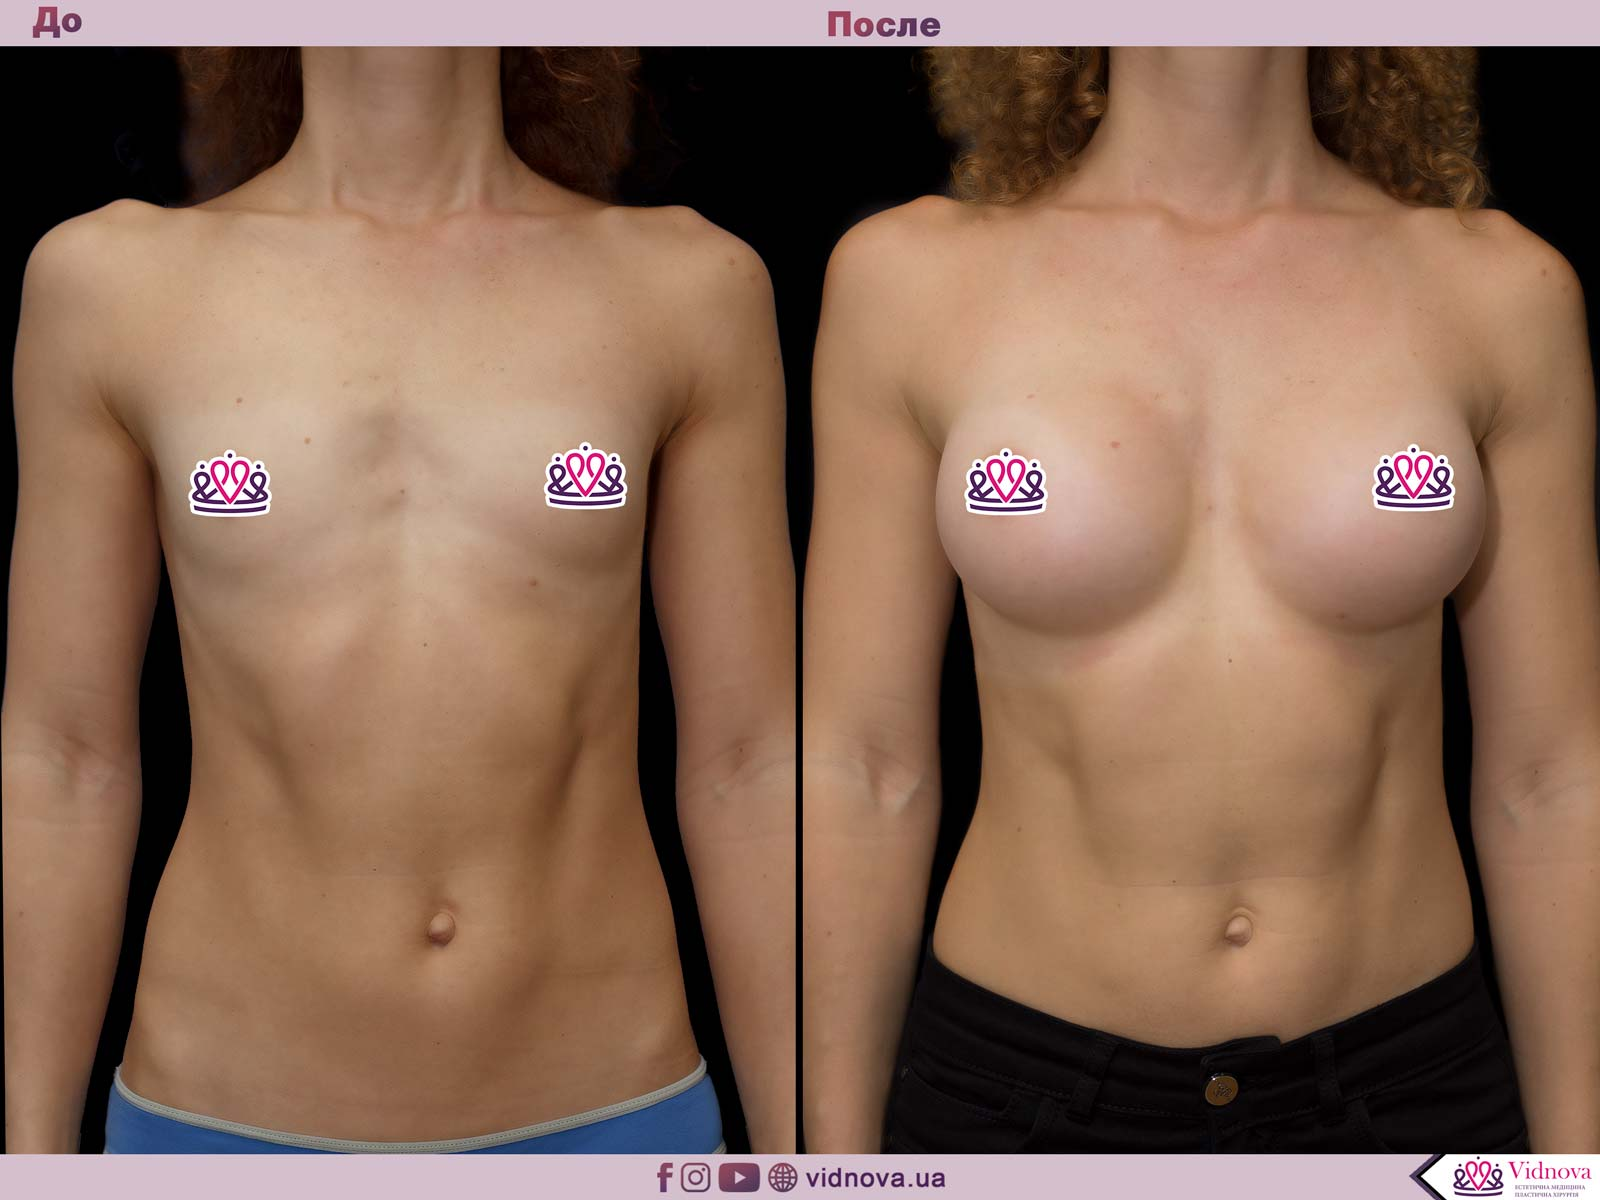 Увеличение груди: Фото ДО и ПОСЛЕ - Пример №42-1 - Клиника Vidnova